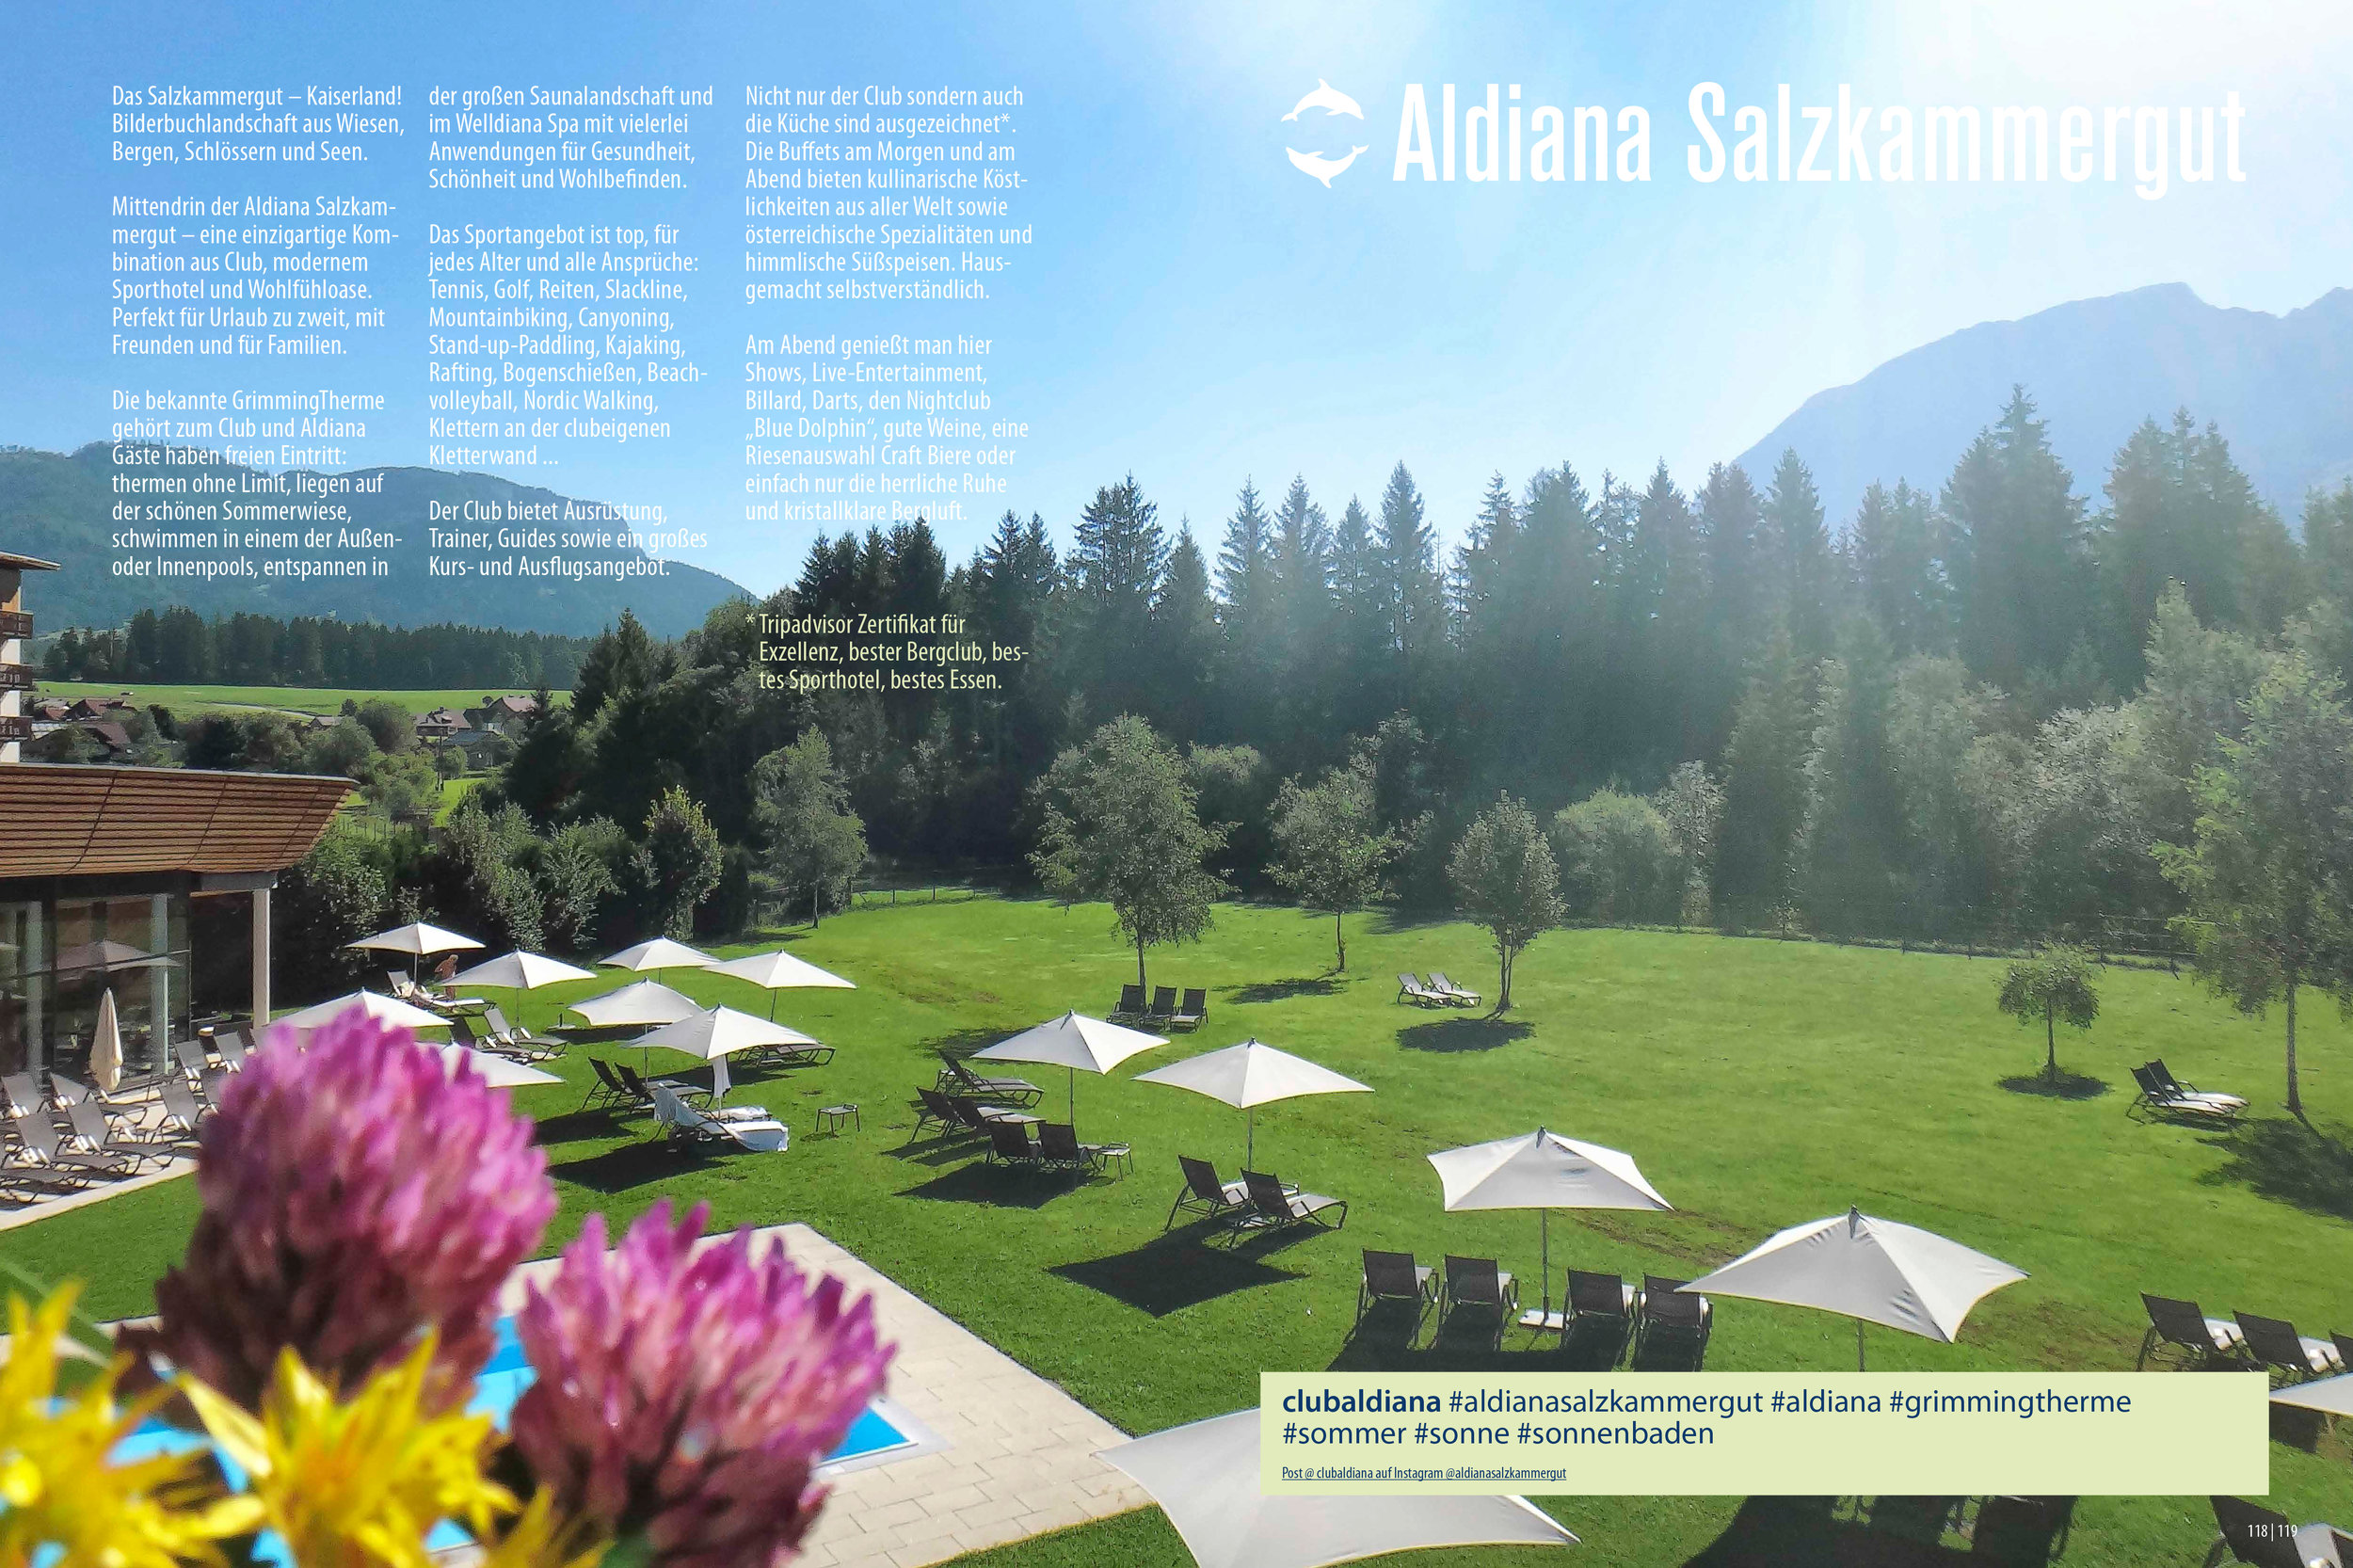 Aldiana Katalog Sommer 2017 Club Salzkammergut